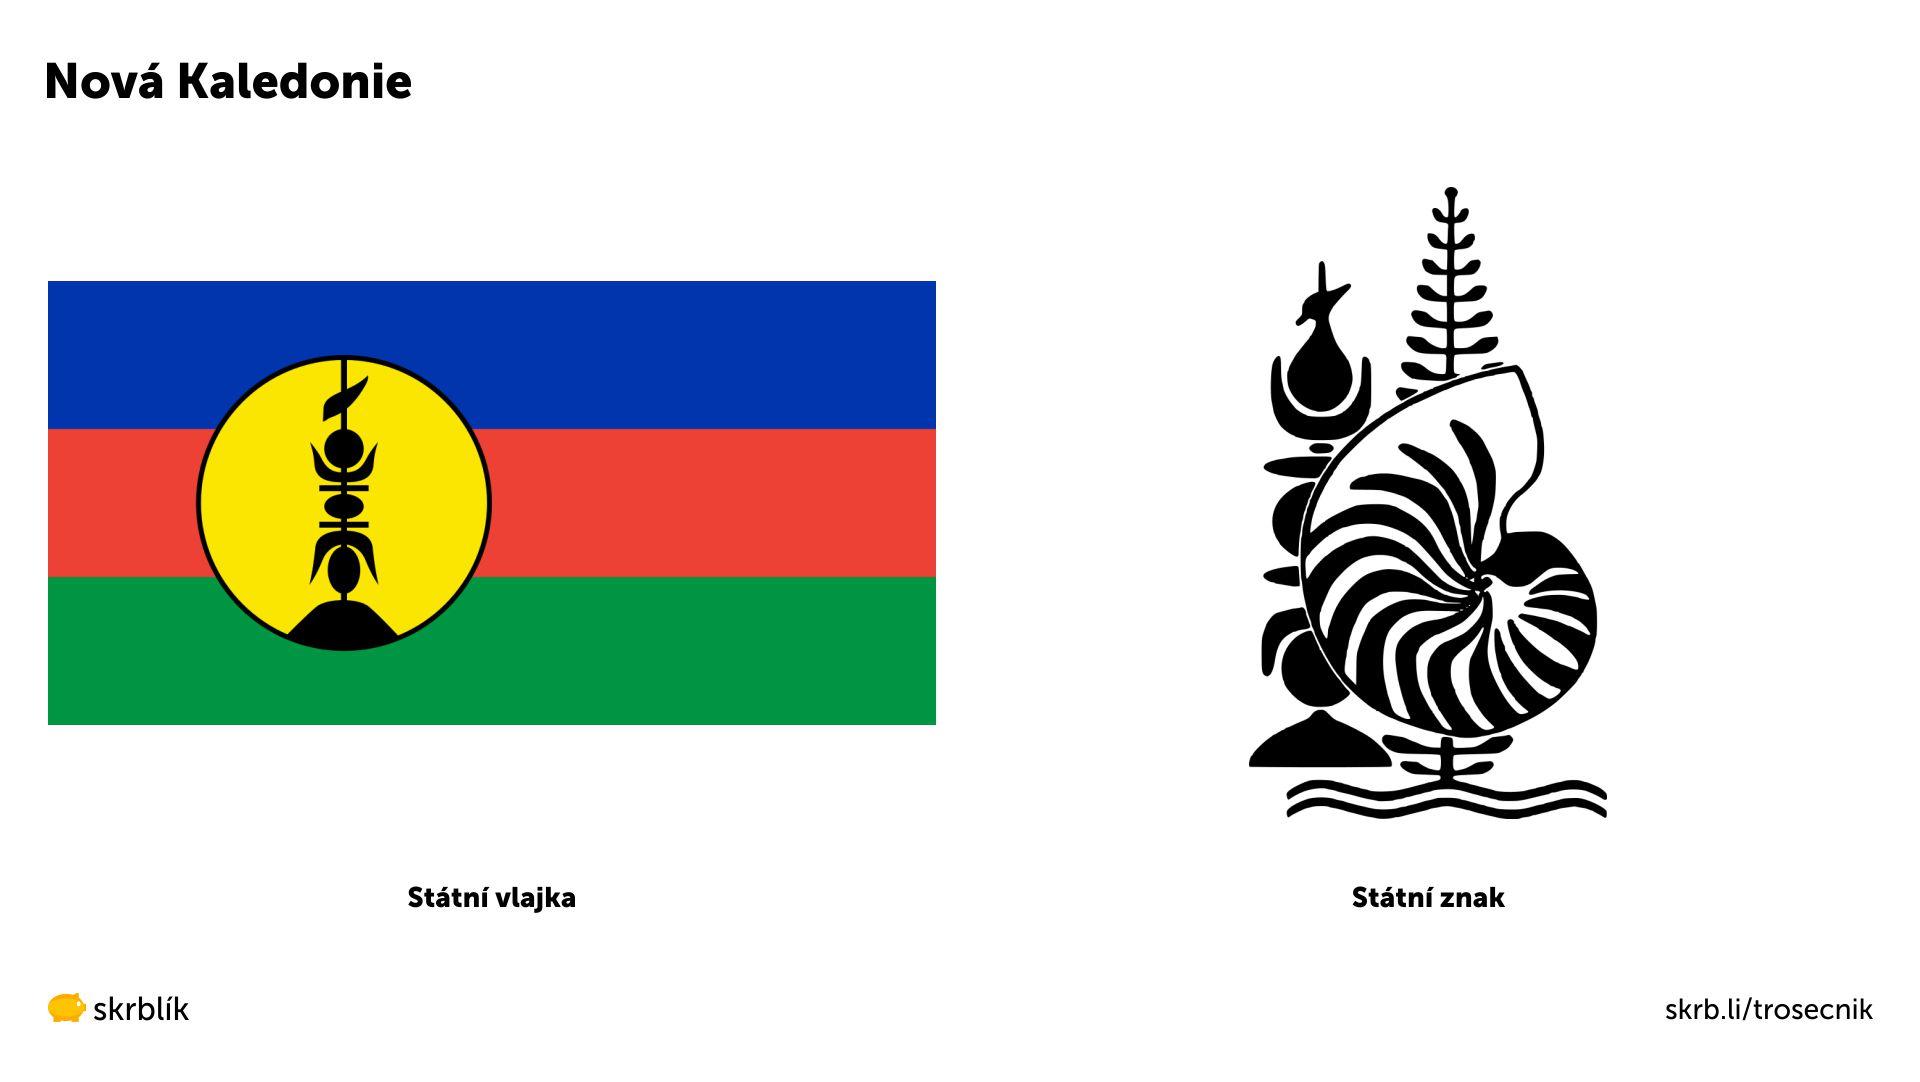 Nová Kaledonie